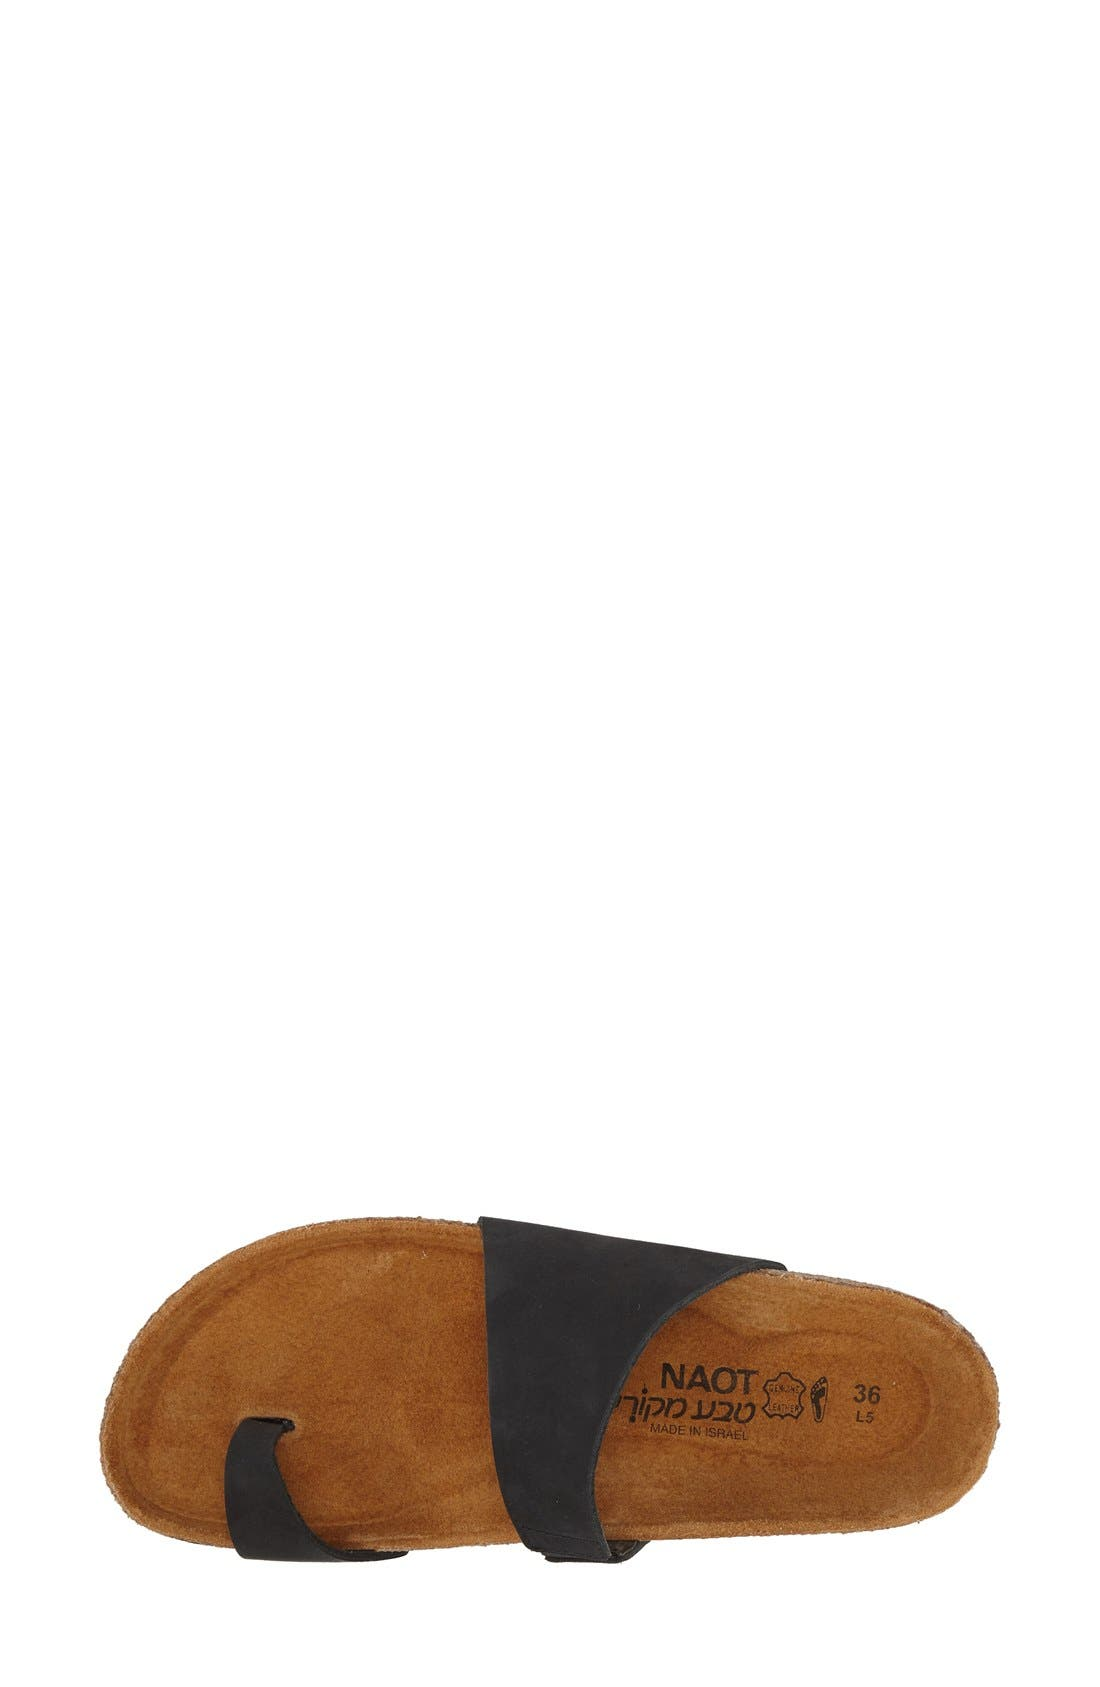 'Santa Fe' Sandal,                             Alternate thumbnail 5, color,